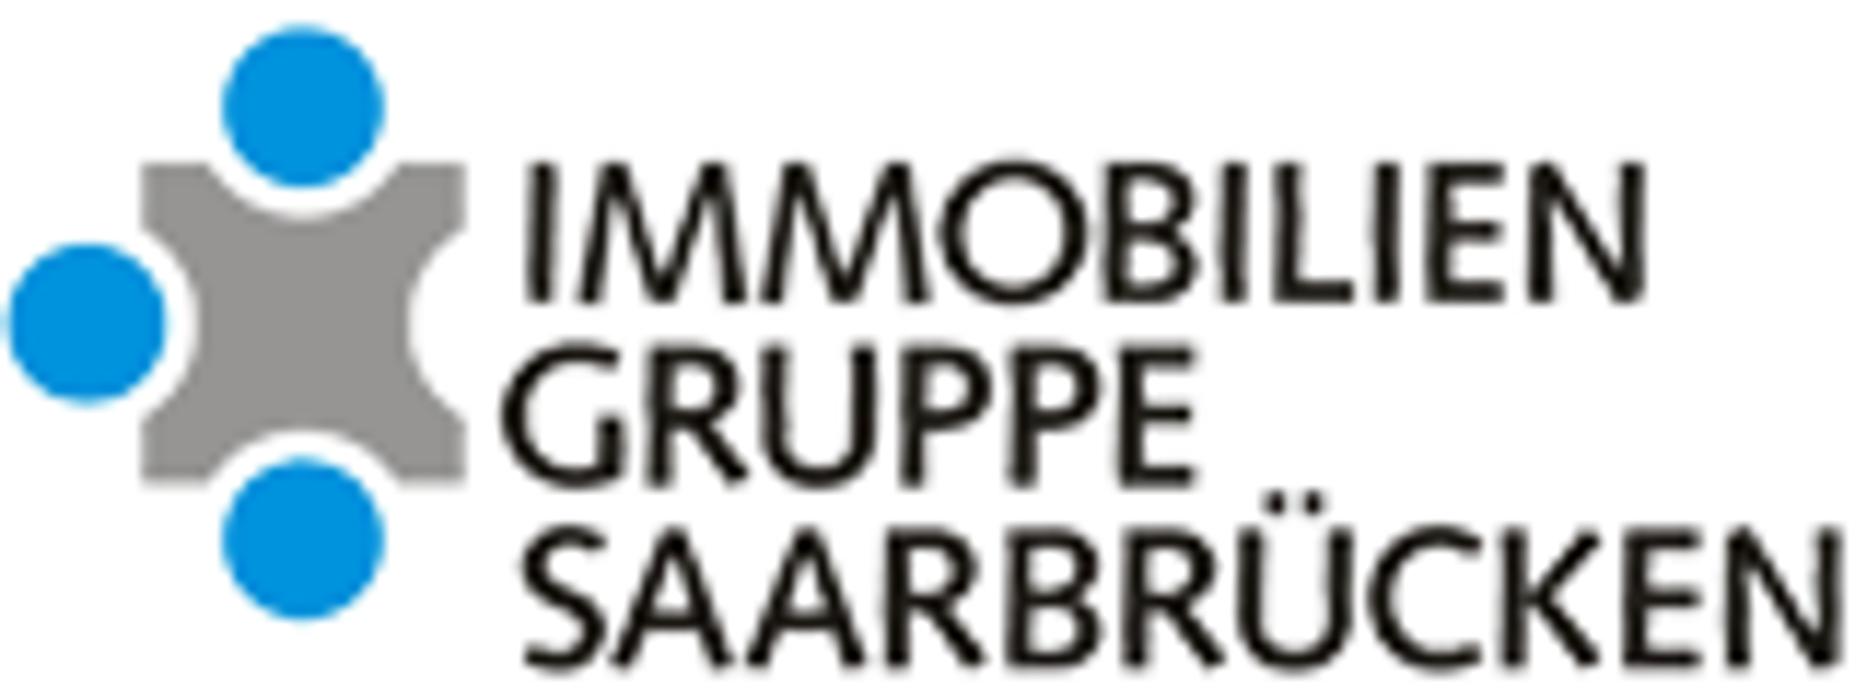 Bild zu Immobiliengruppe Saarbrücken in Saarbrücken